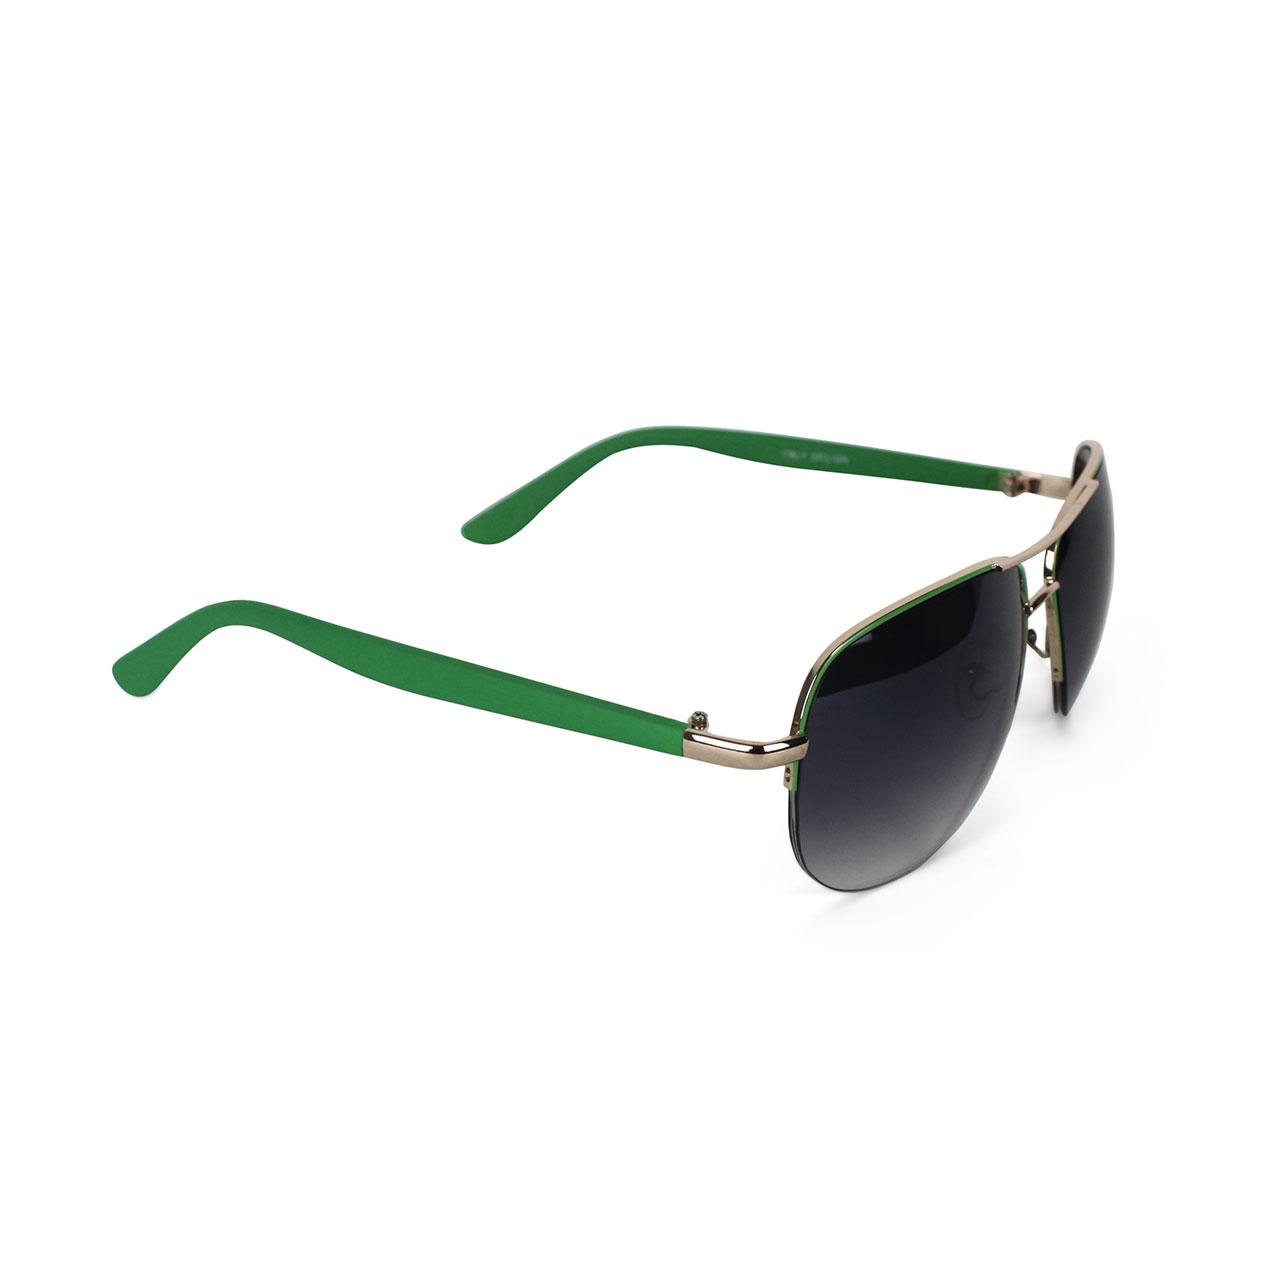 Unisex Polarized half rimmed Green Aviator Sunglasses